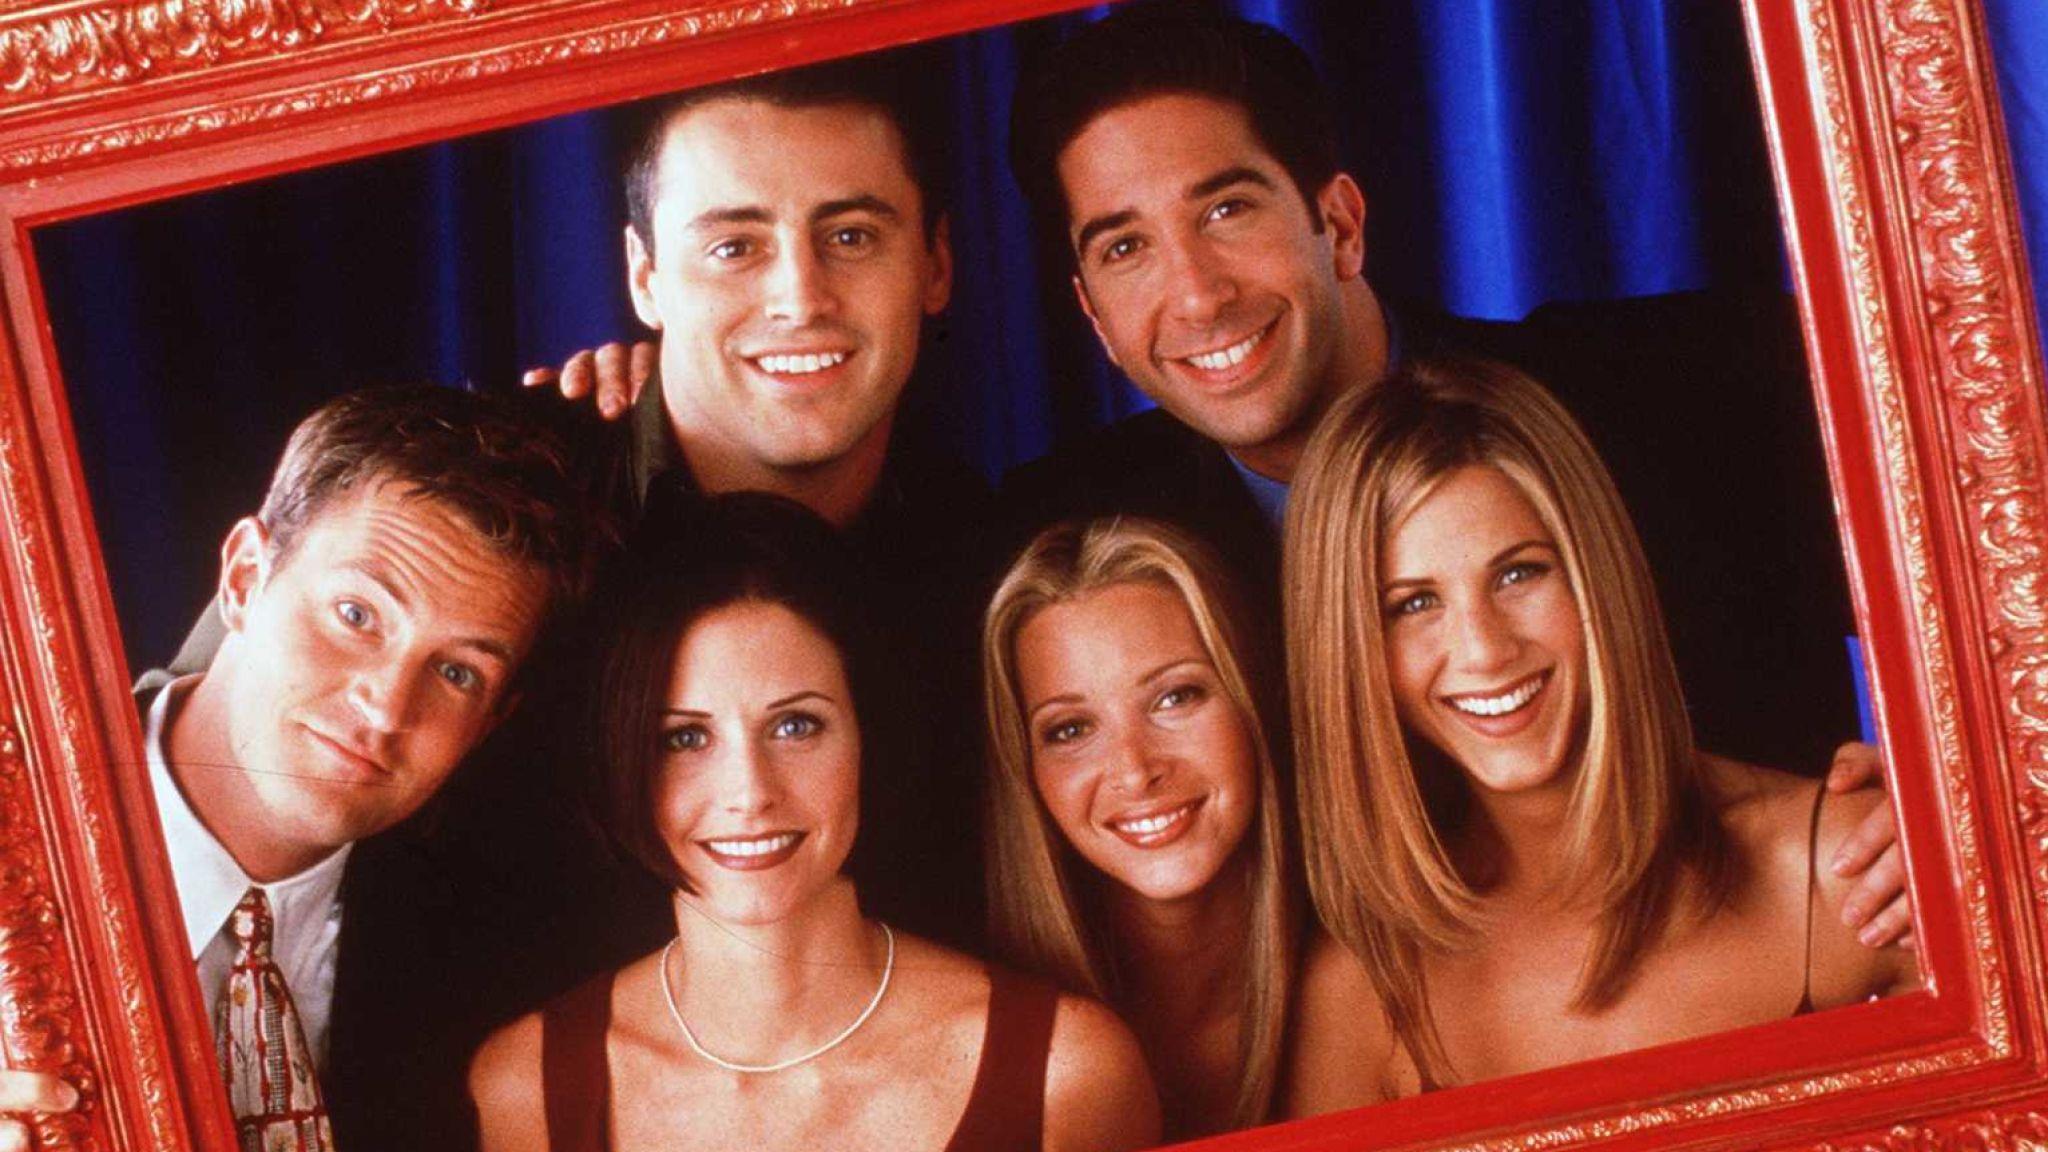 The cast of Friends, clockwise from top left: Matt LeBlanc (Joey), David Schwimmer (Ross), Jennifer Aniston (Rachel), Lisa Kudrow (Phoebe), Courteney Cox (Monica), Matthew Perry (Chandler)